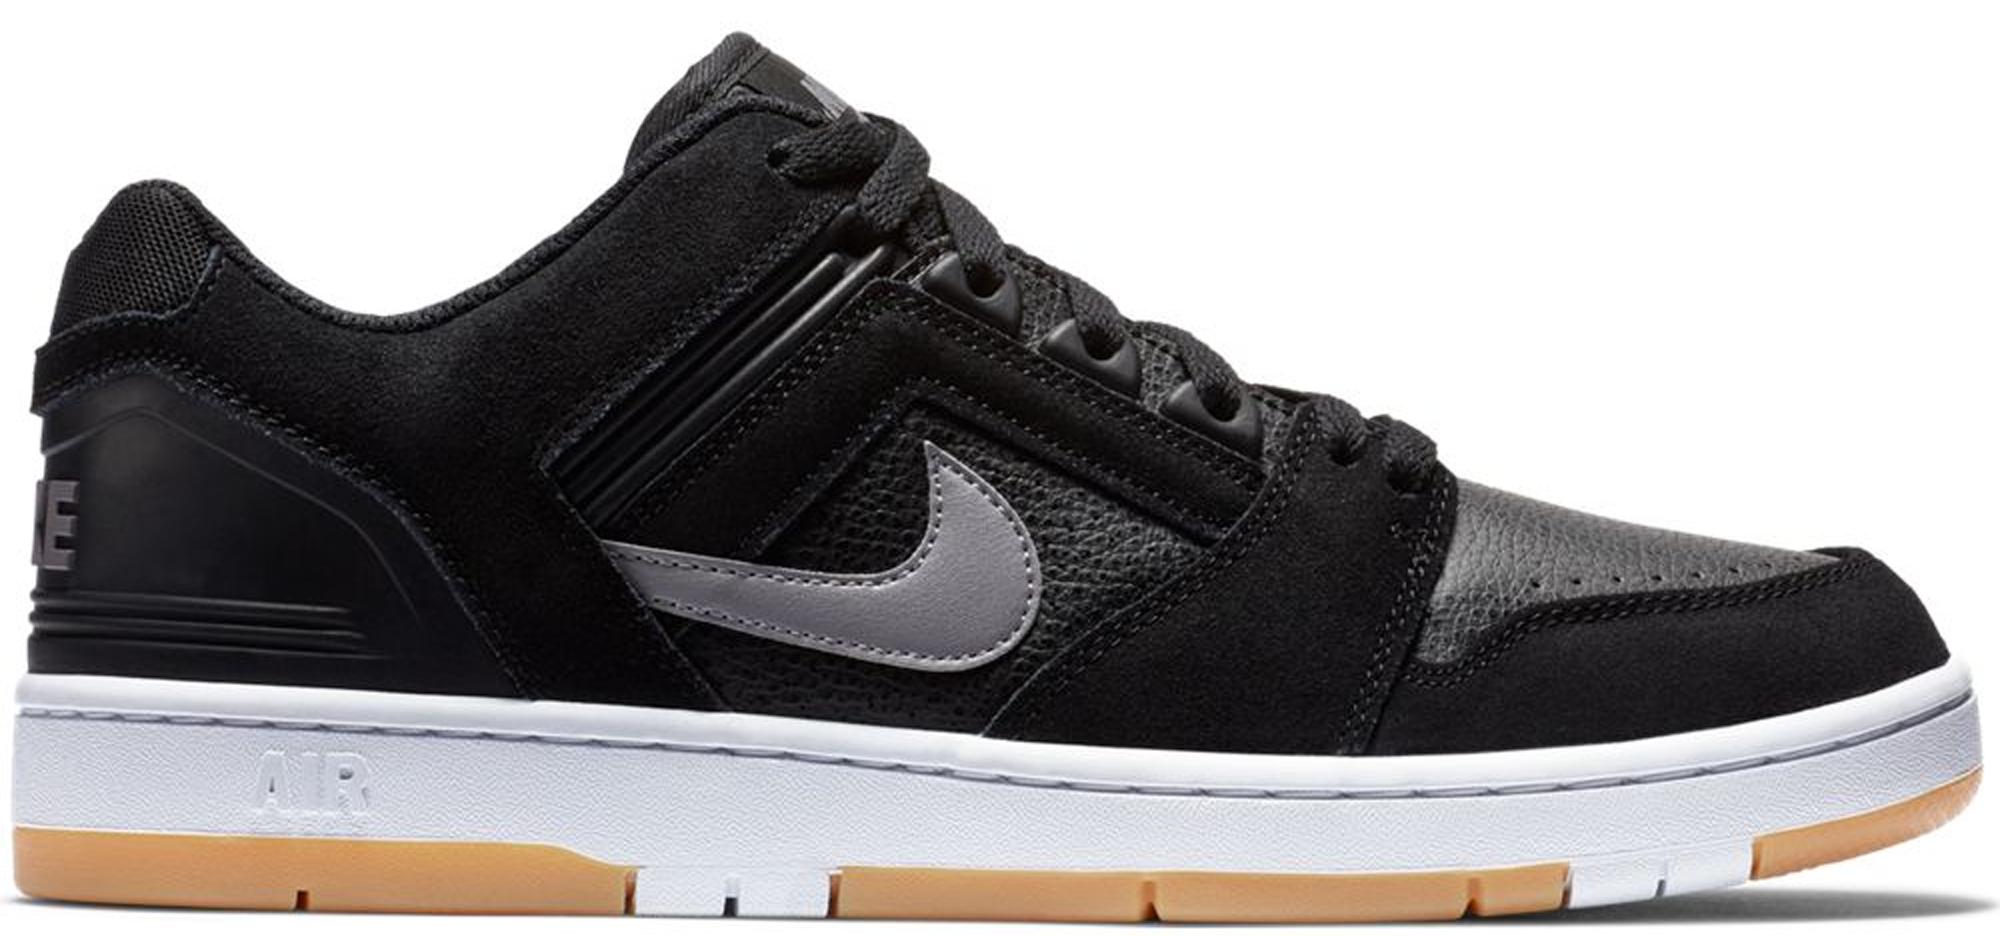 Nike SB Air Force 2 Low Black Grey Gum